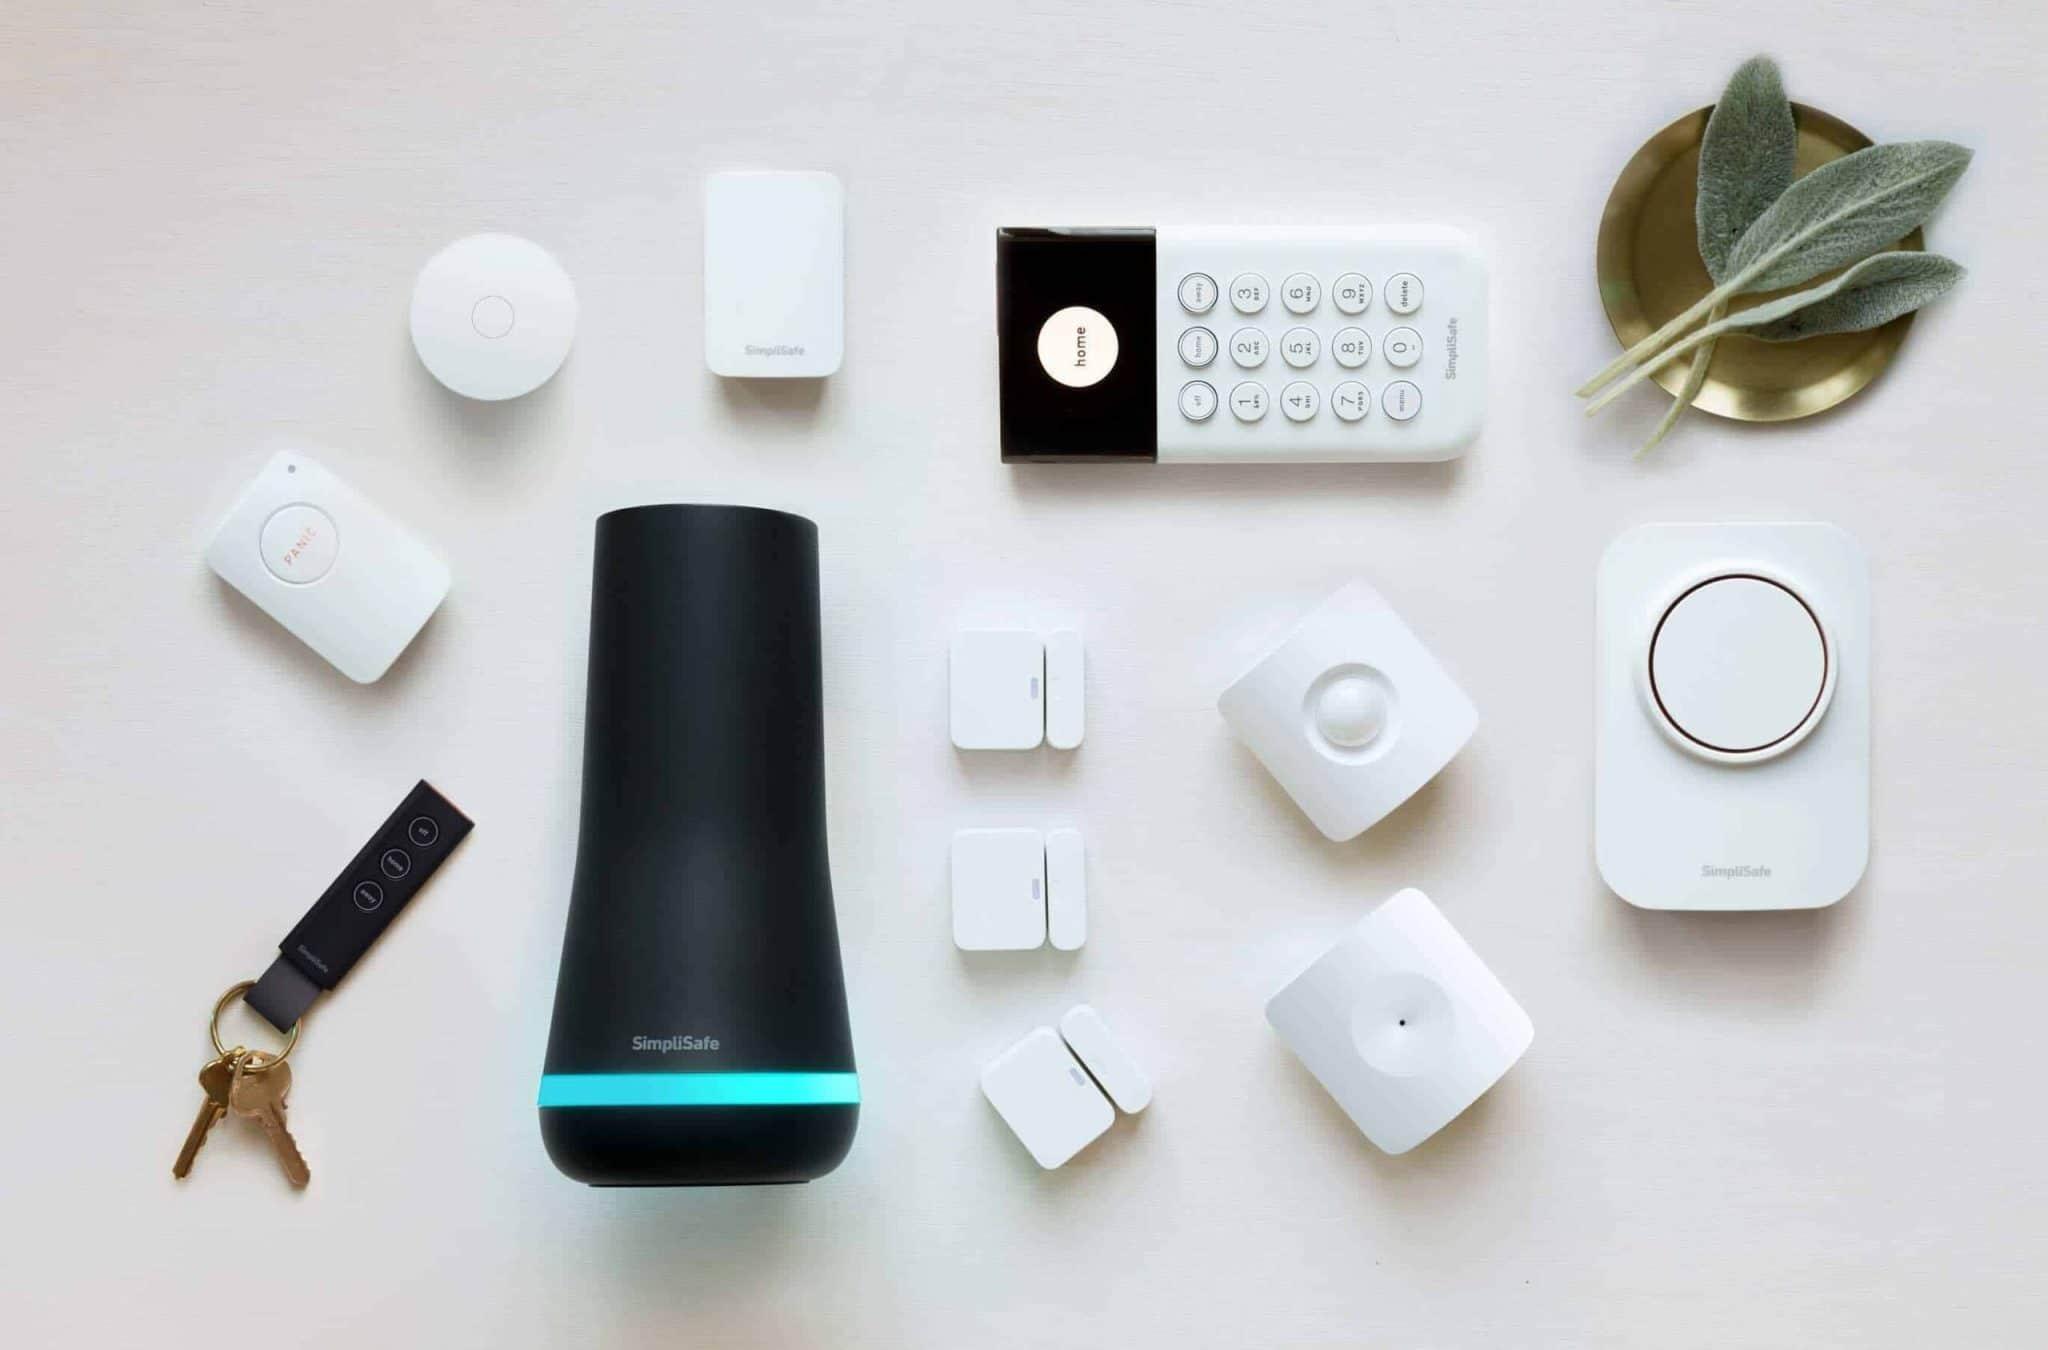 Do I Need to Hardwire my SimpliSafe Doorbell?